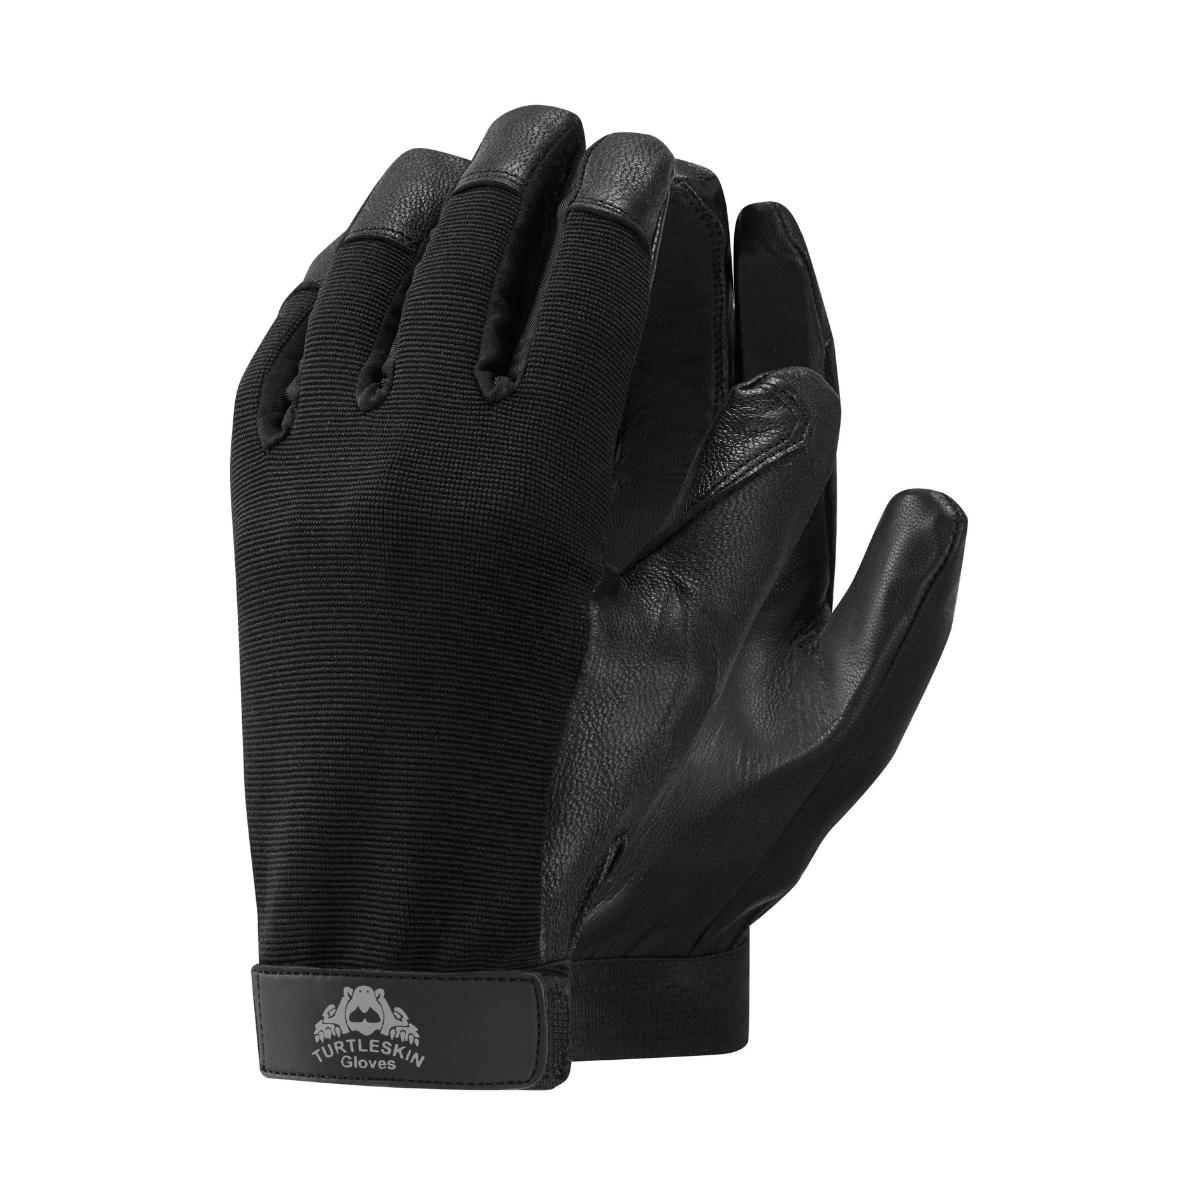 GL3993_Turtleskin Cut & Needle Protection Gloves